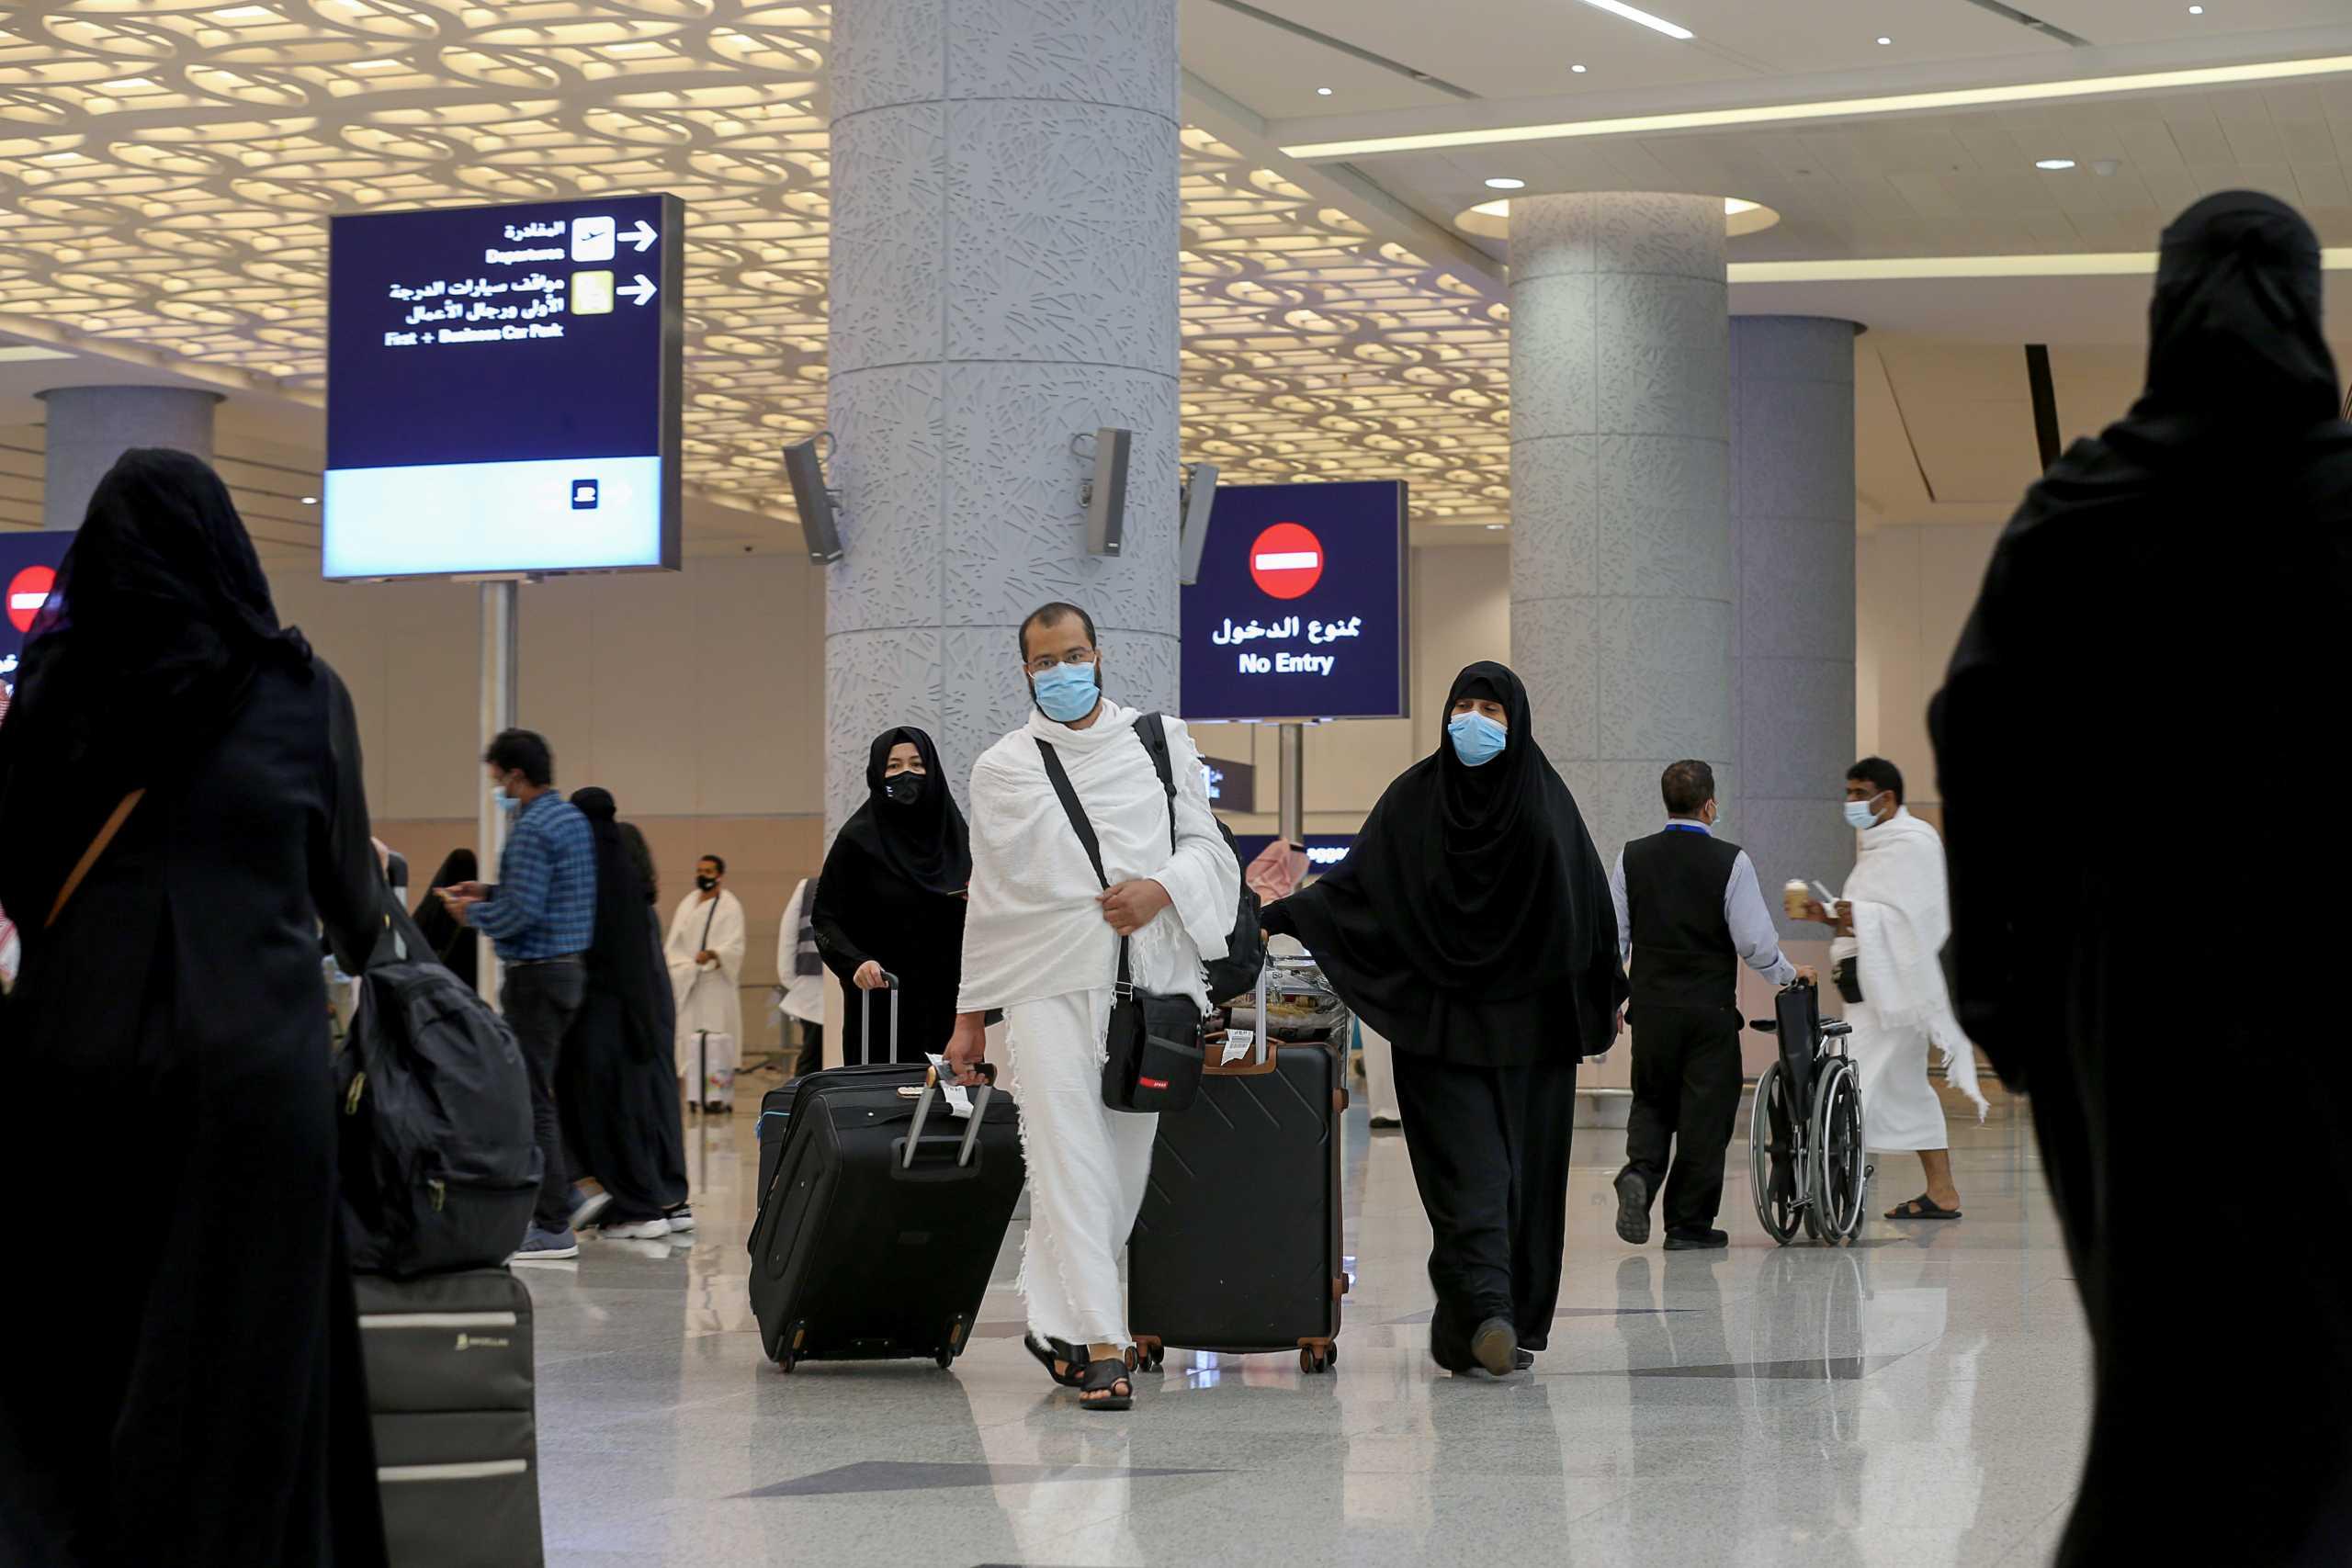 Kουβέιτ: Τέλος τα ταξίδια στο εξωτερικό για τους ανεμβολίαστους